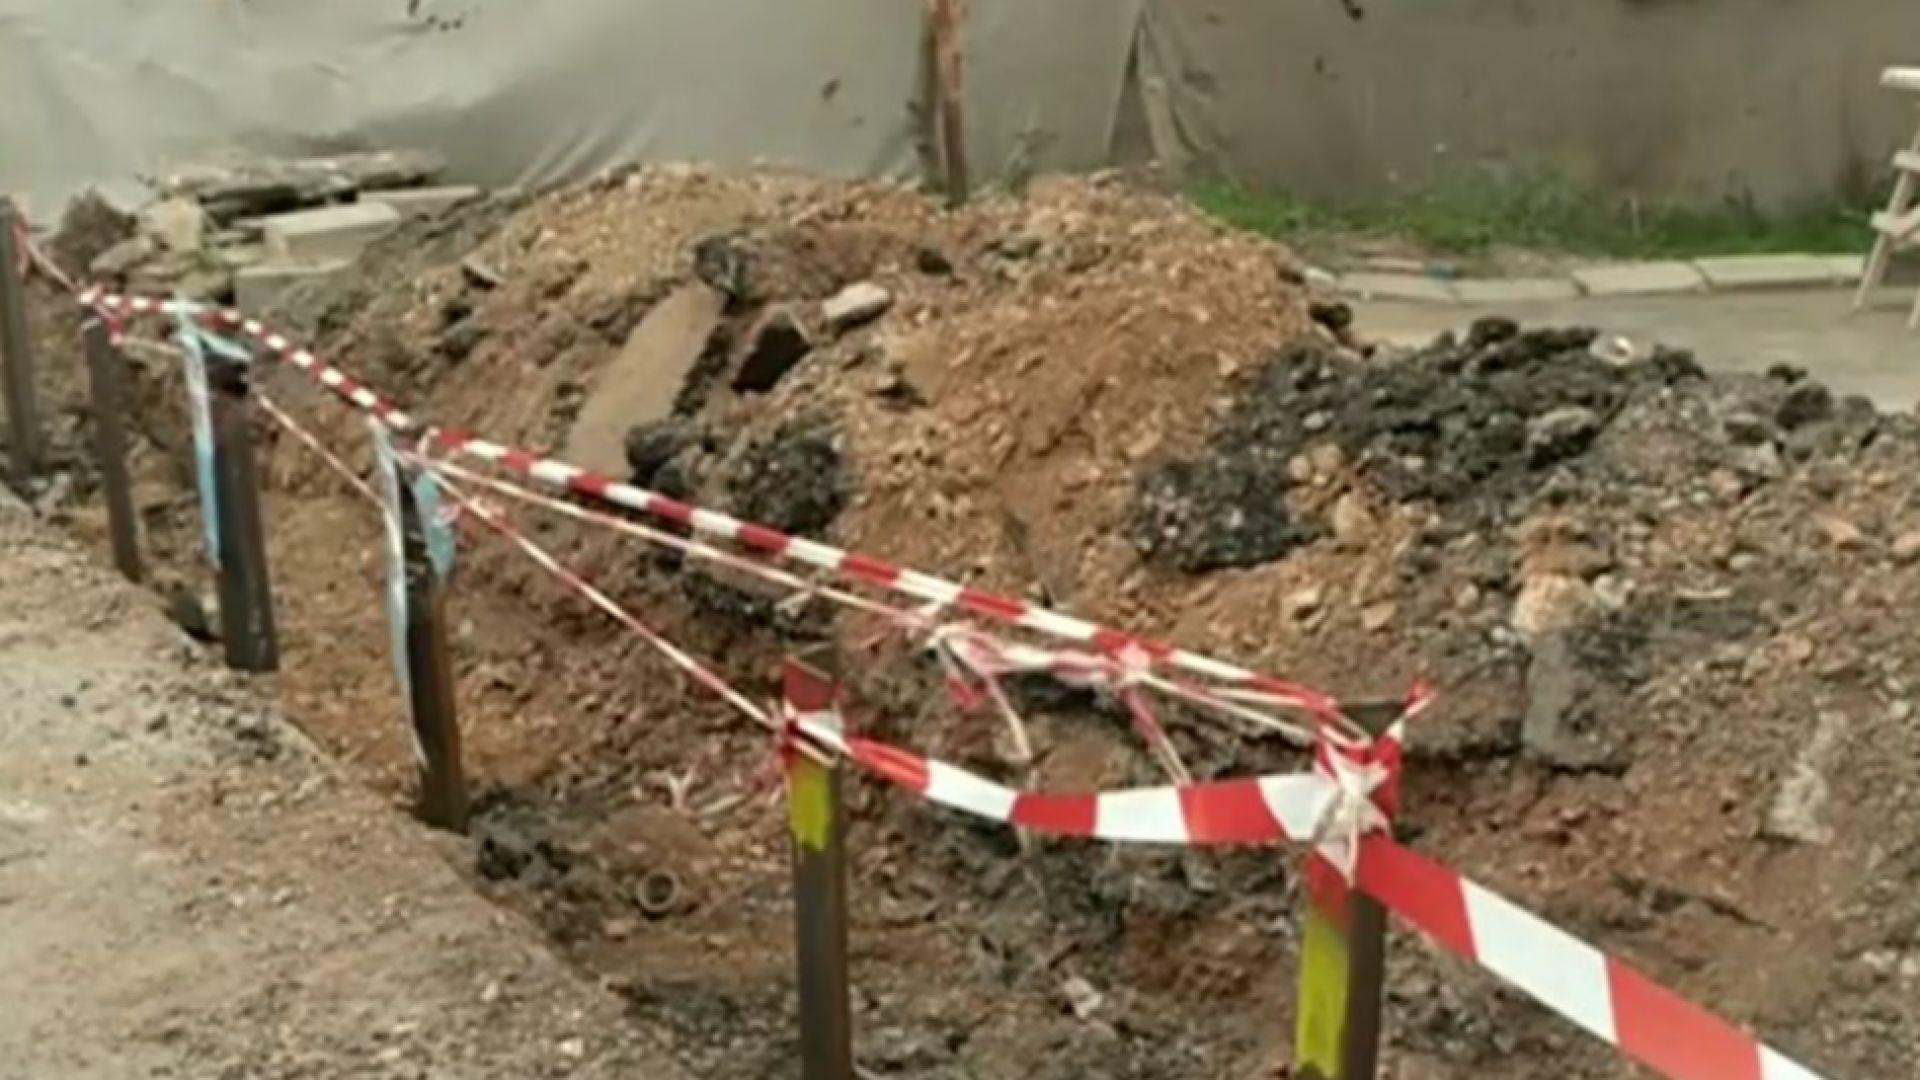 Собственици разкопаха и преградиха улица като частен имот